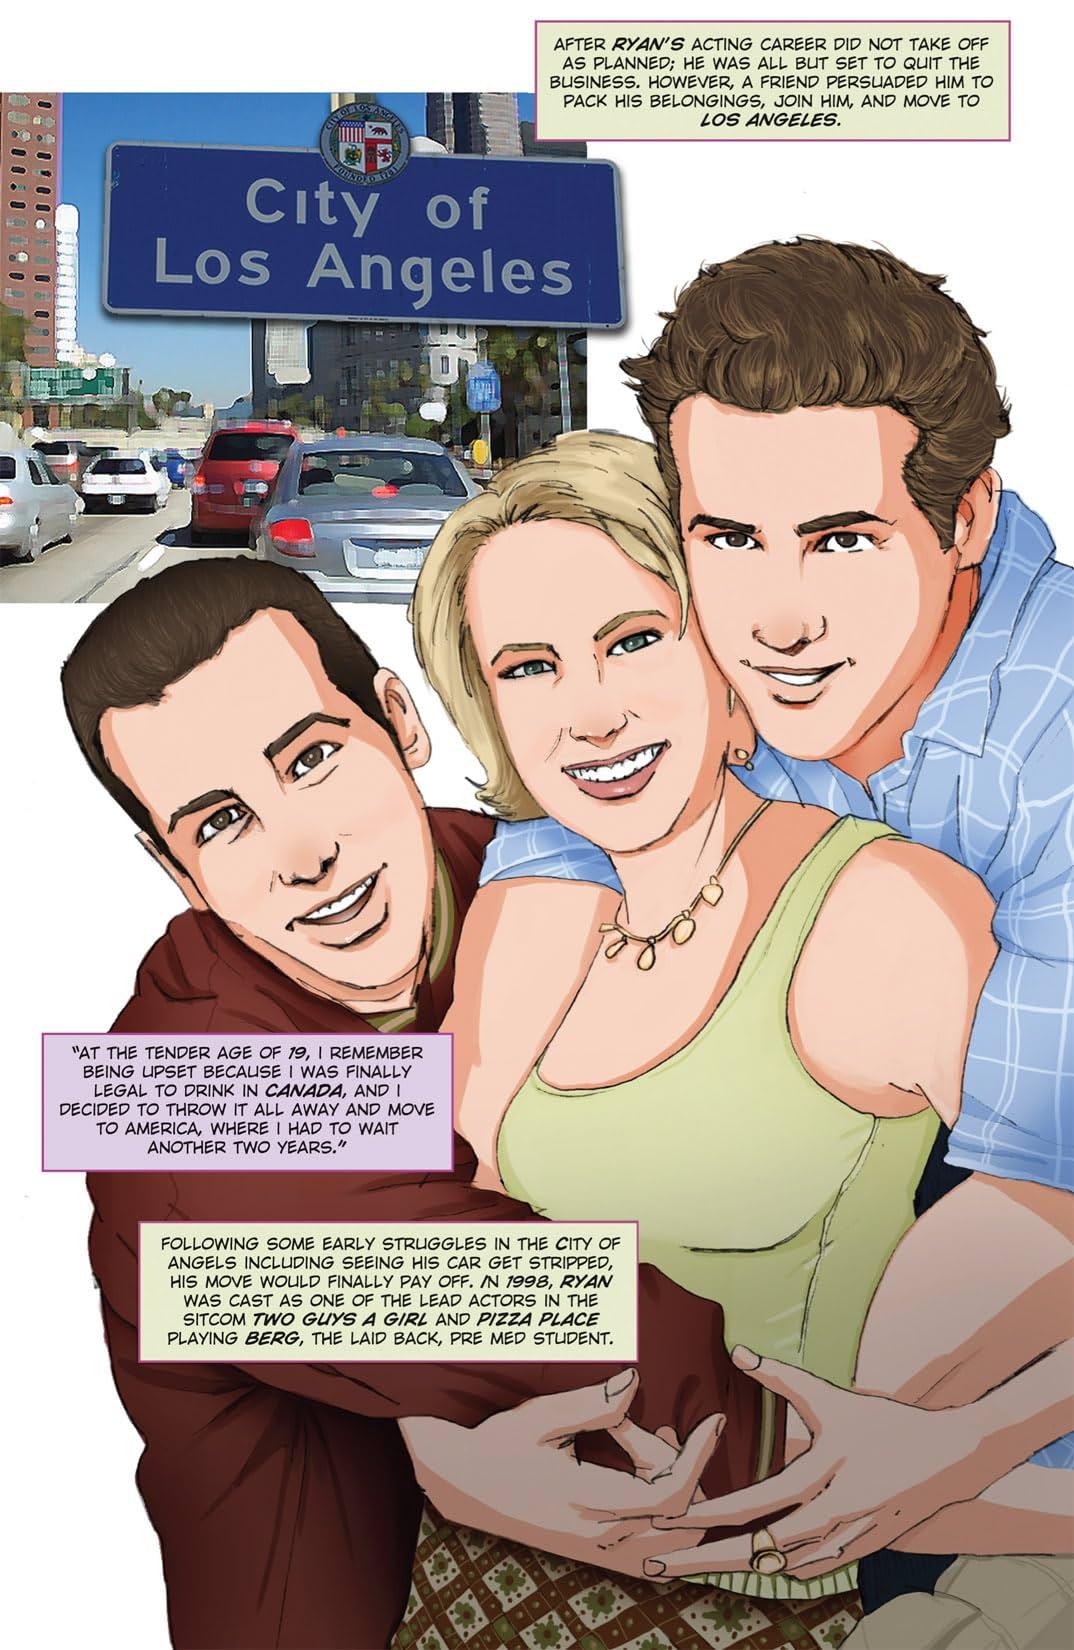 Fame: Ryan Reynolds